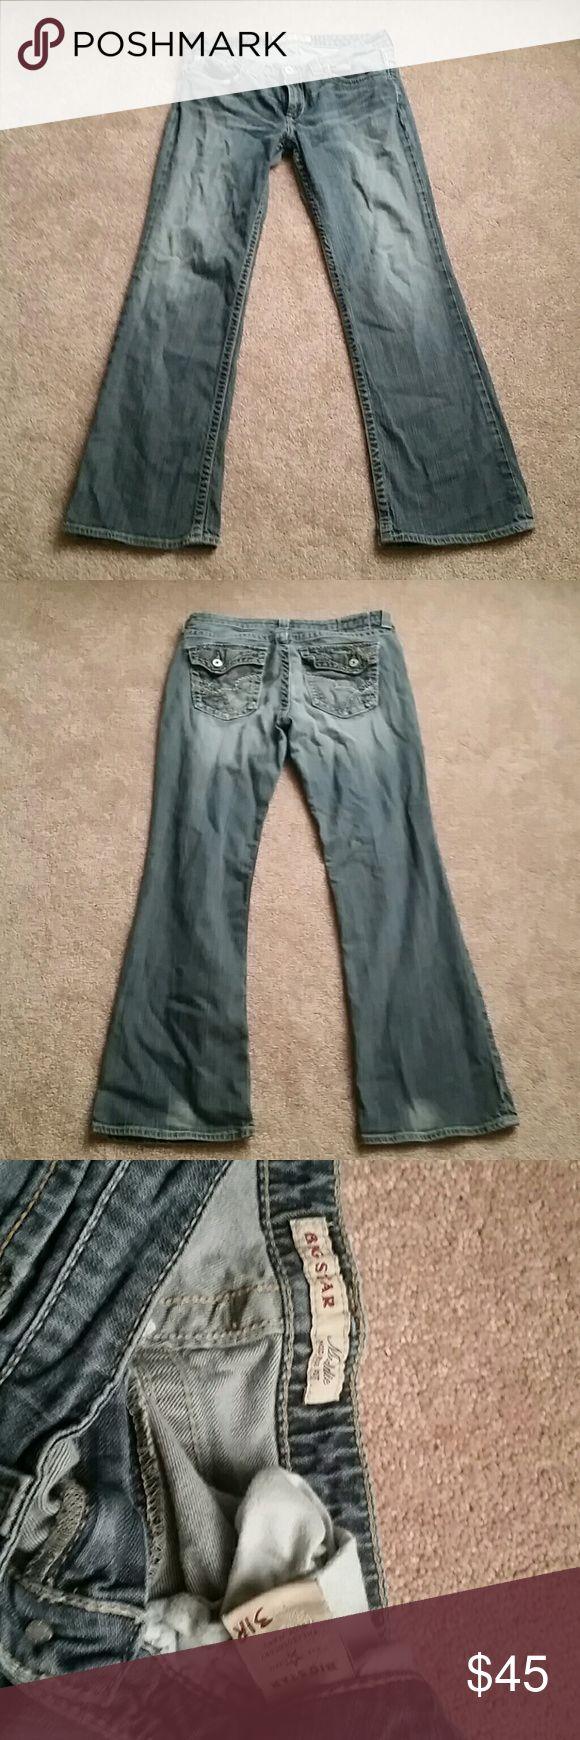 "Women's Big Star Maddie Jean's 31R No damages, cute fit, flap back pockets. Inseam 32"". Big Star Jeans Boot Cut"